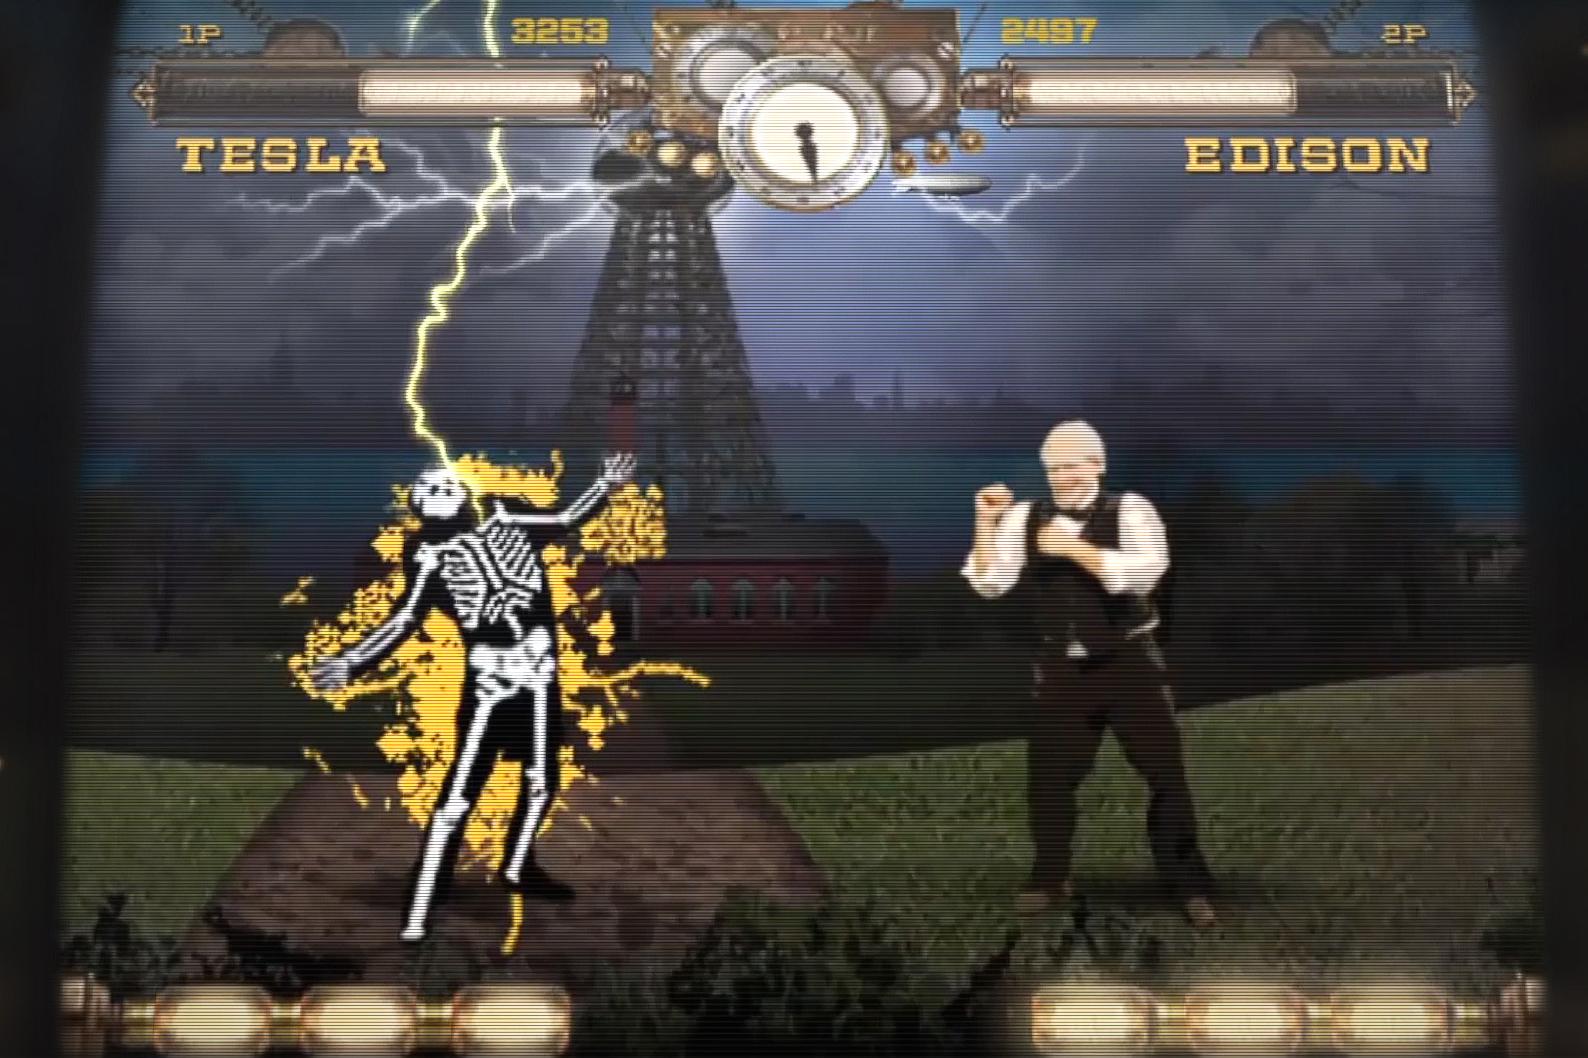 Arcade Game Pits Thomas Edison Against Nikola Tesla, Lets Players Electrocute Each Other